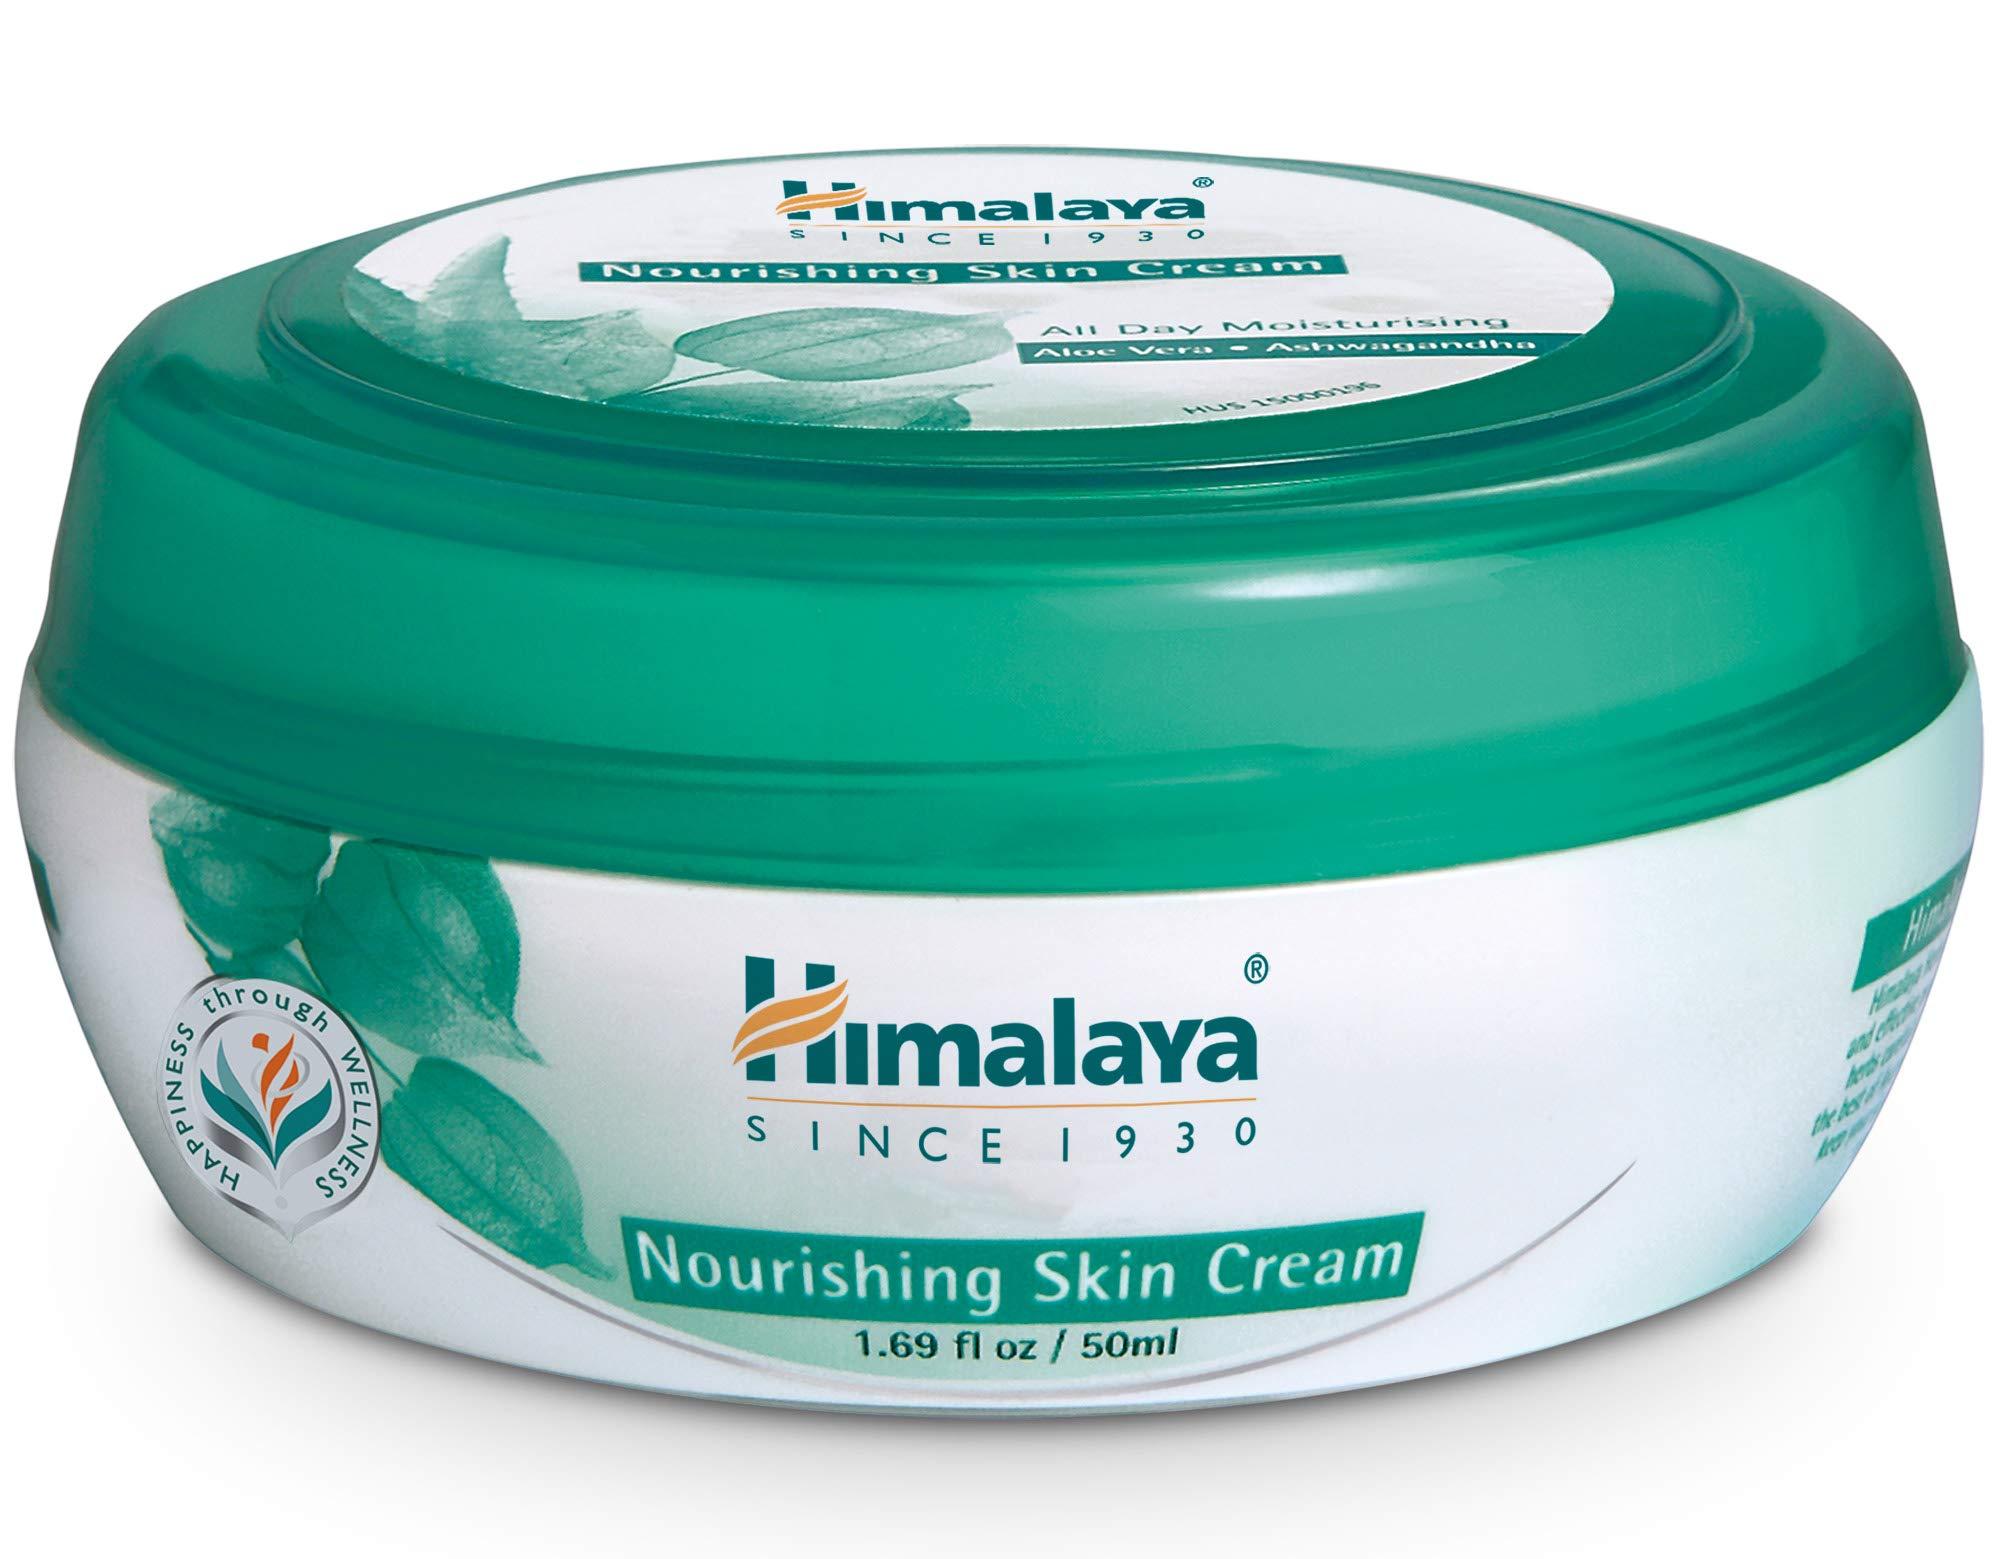 Himalaya Nourishing Skin Renewal Cream Ultra Hydrating for Soft Skin, 1.69 oz